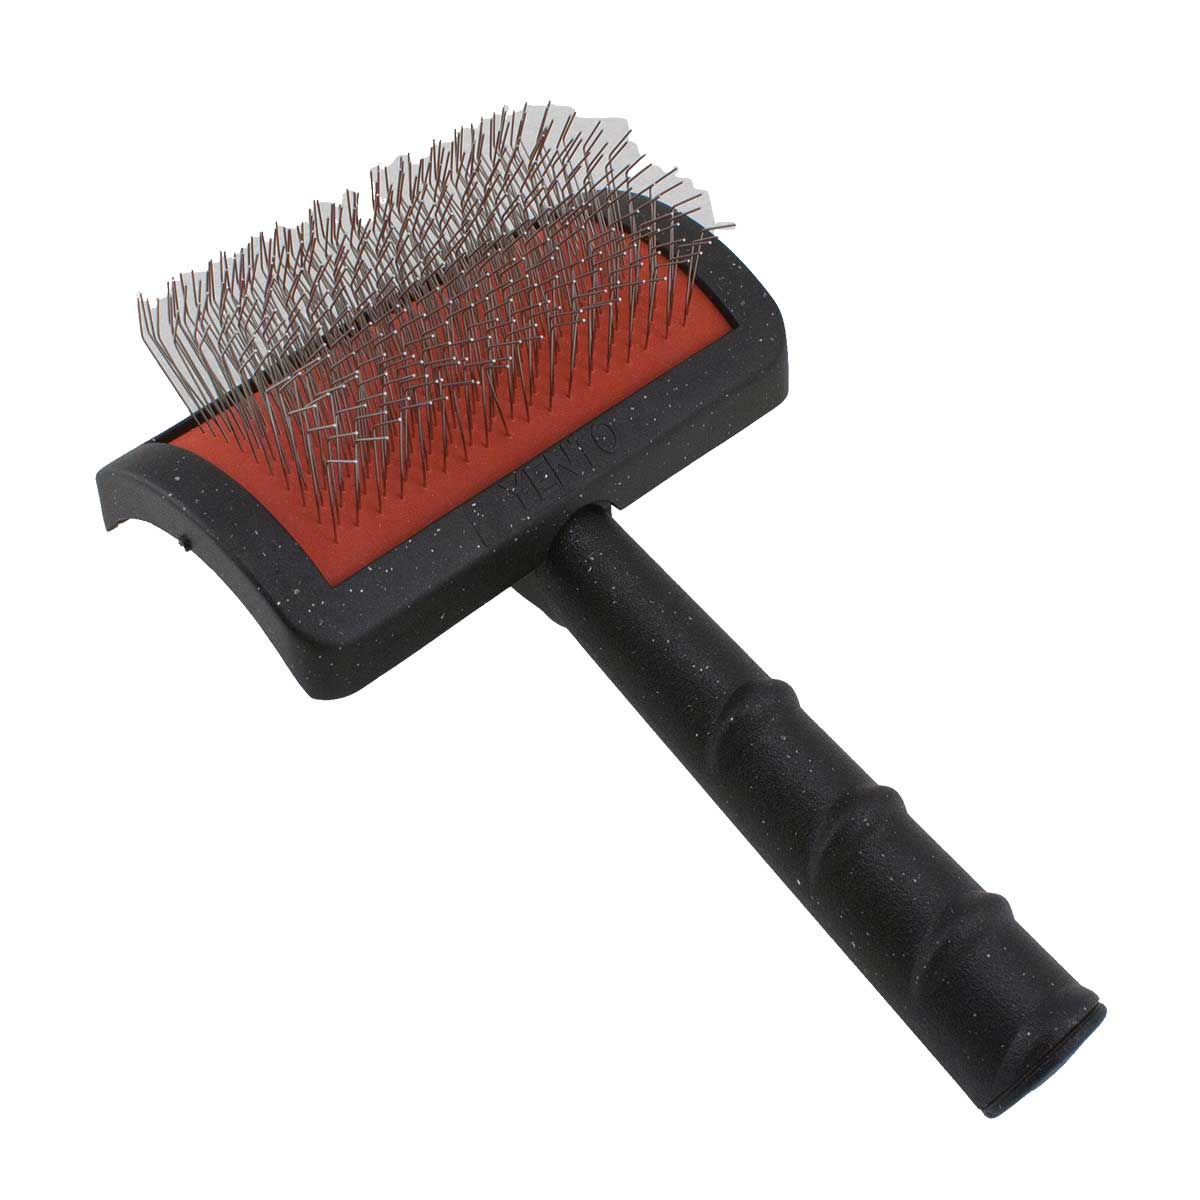 Yento Mega Pin Medium Slicker Brush for Pet Grooming